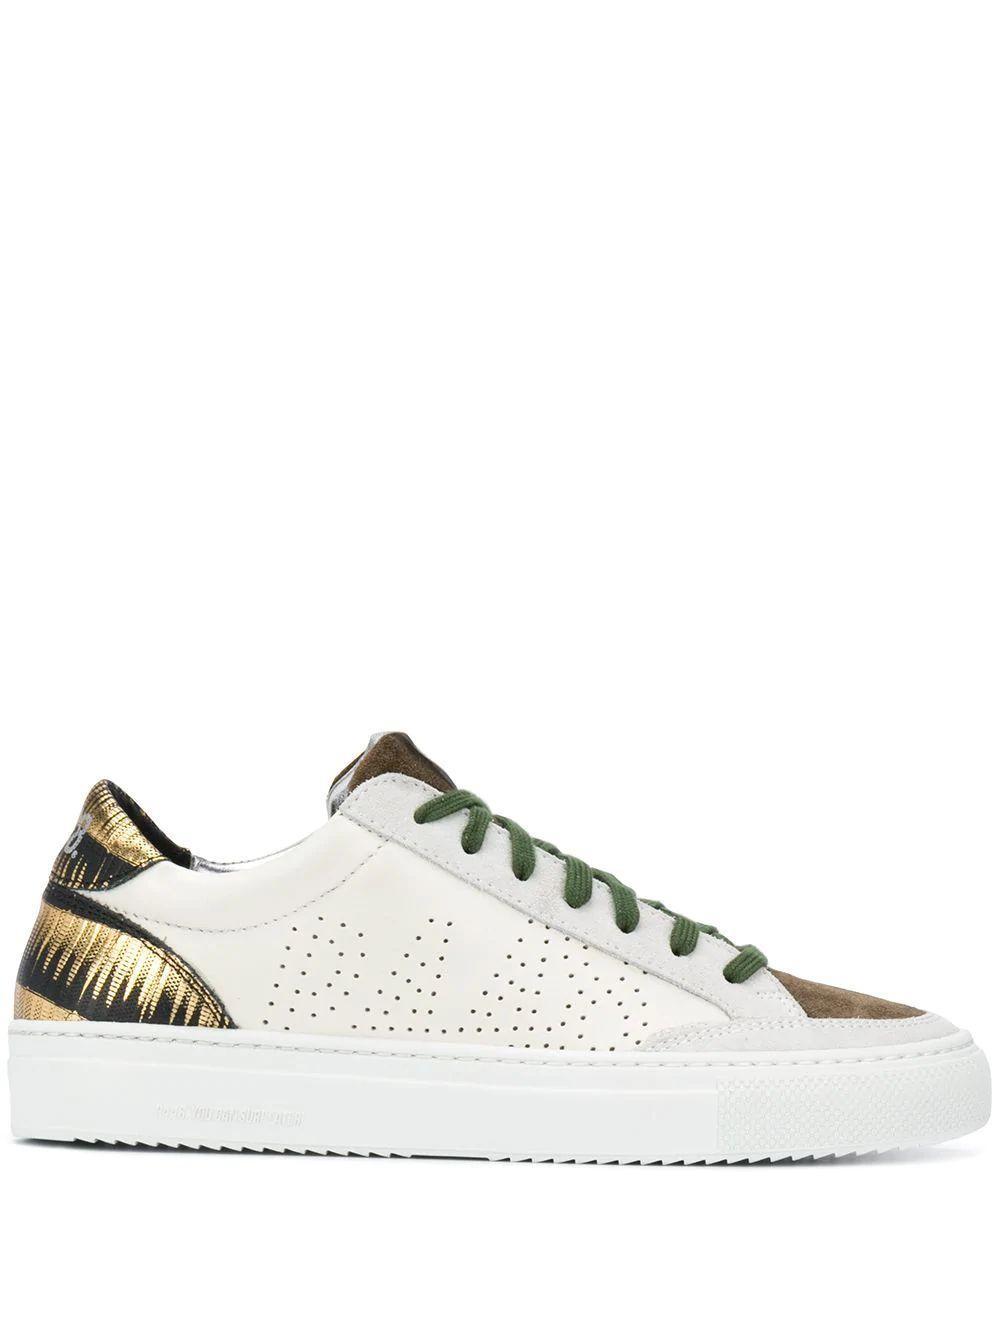 Soho Bronze Back Sneaker Item # F20SOHO-W